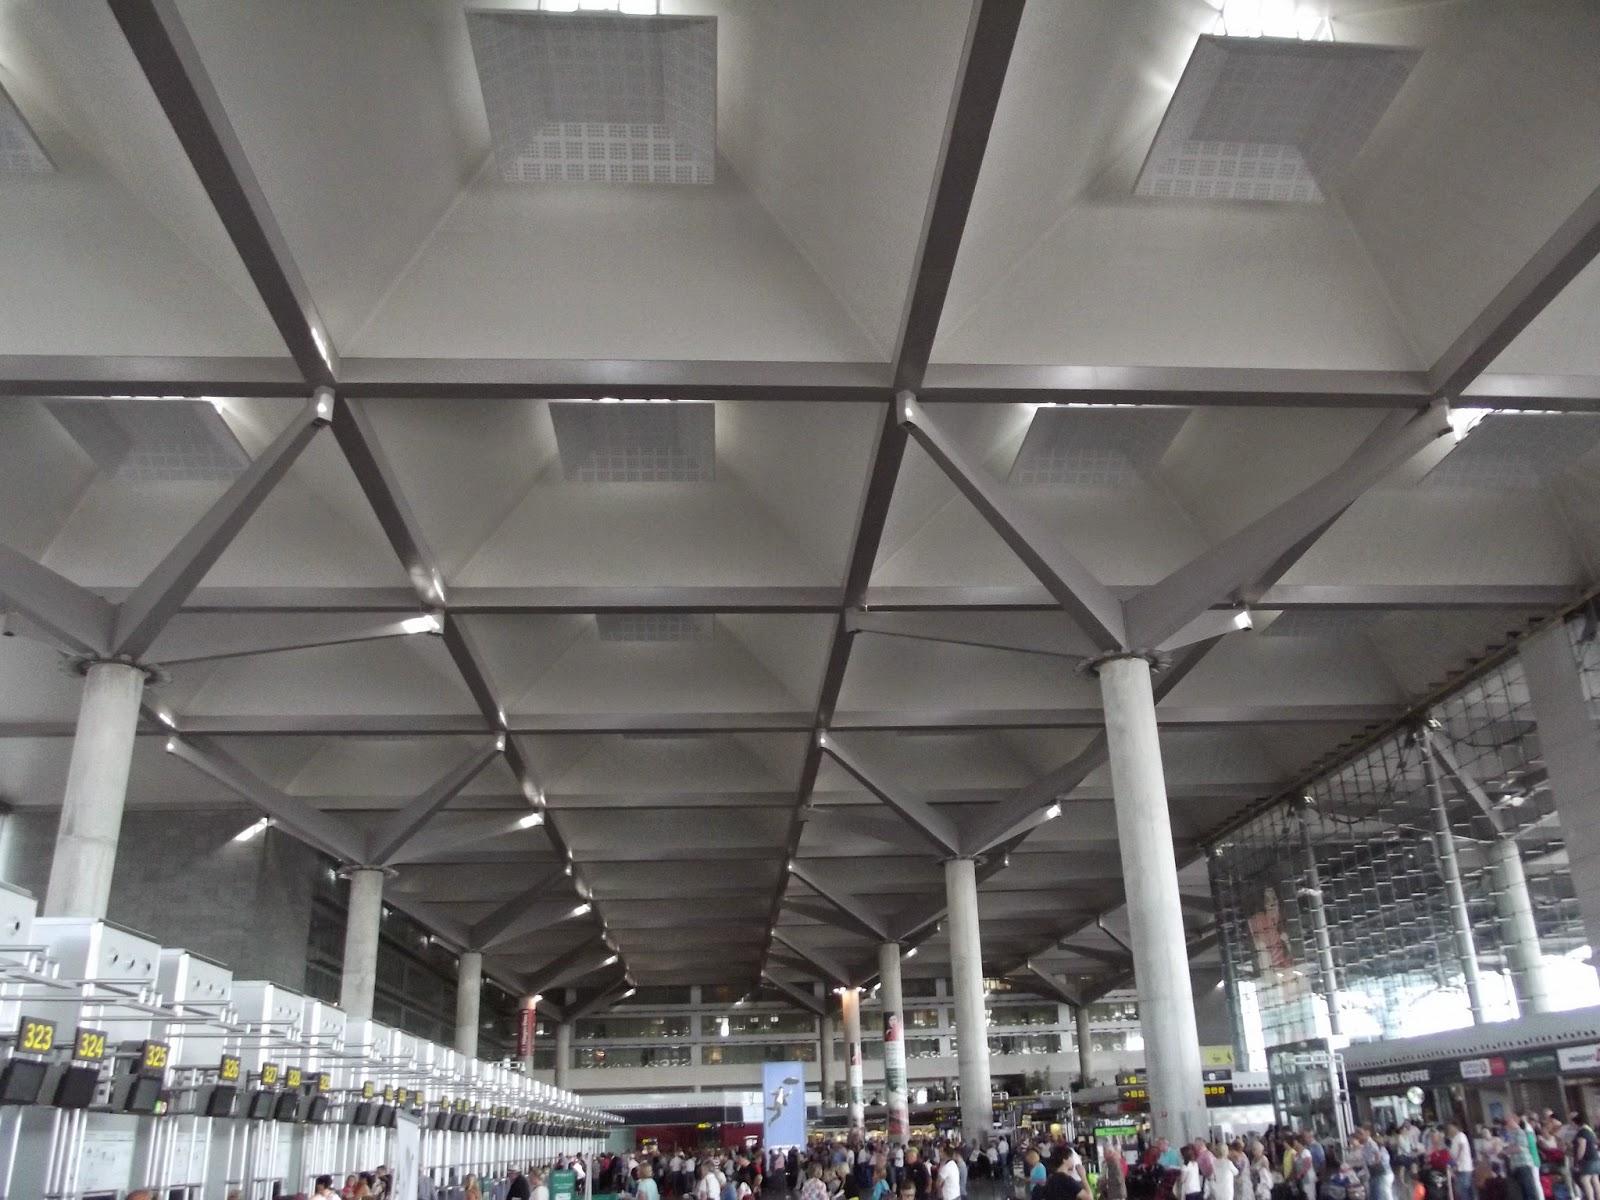 http://www.aena-aeropuertos.es/csee/Satellite/DestinosEspana/de/